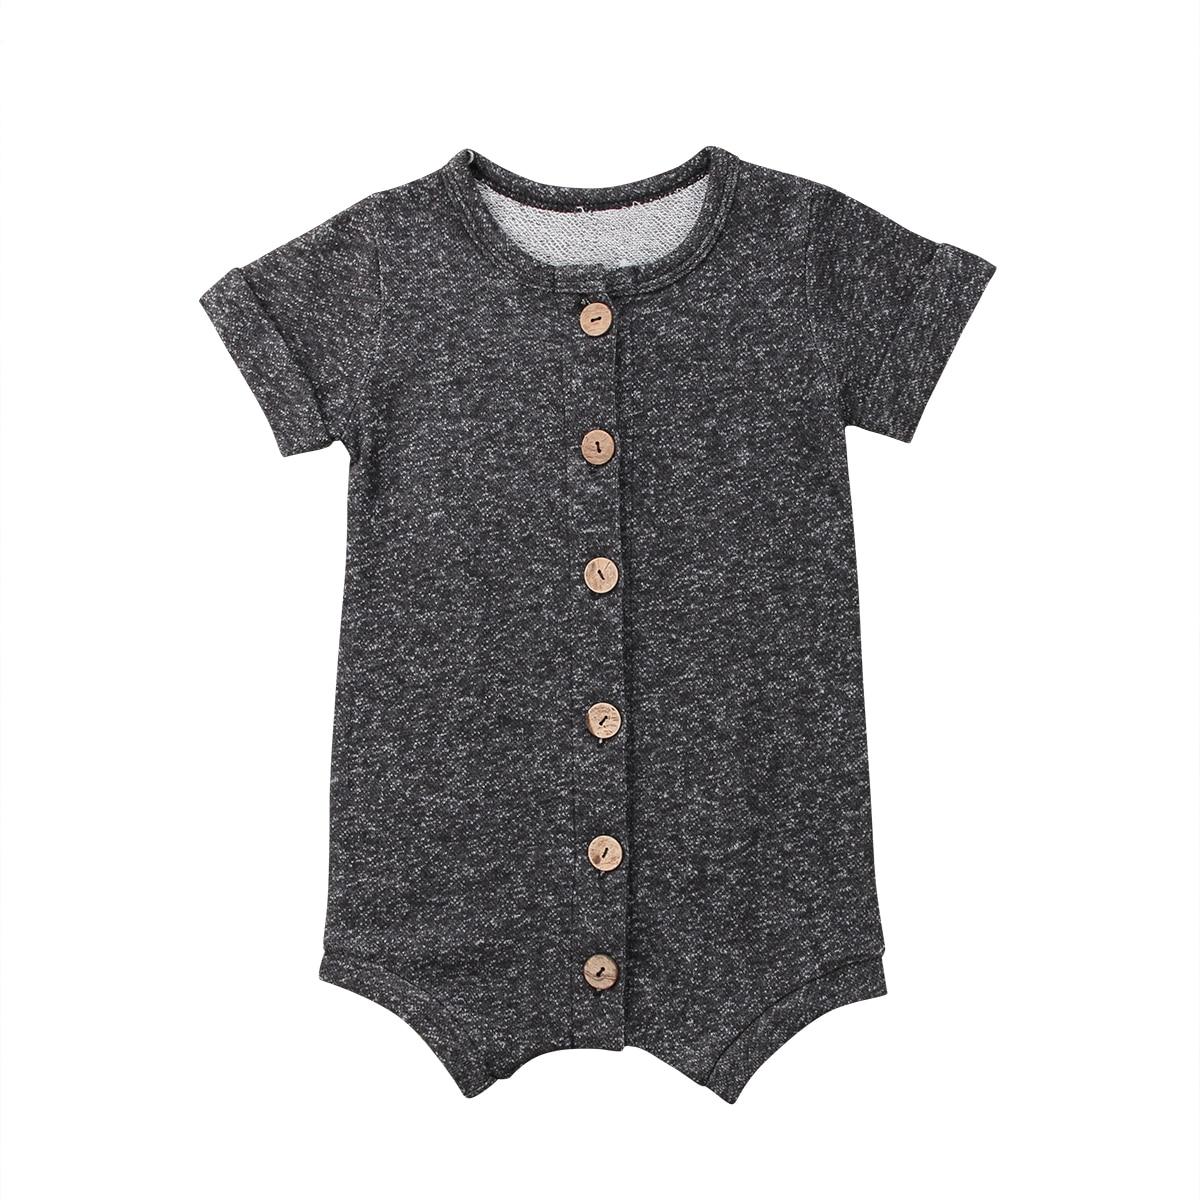 Newborn Baby Boys Girl Romper Jumpsuit Cotton Bodysuit Clothes Outfits  Overalls Clothes  Cotton Shorts  Short Sleeve Jumpsuit